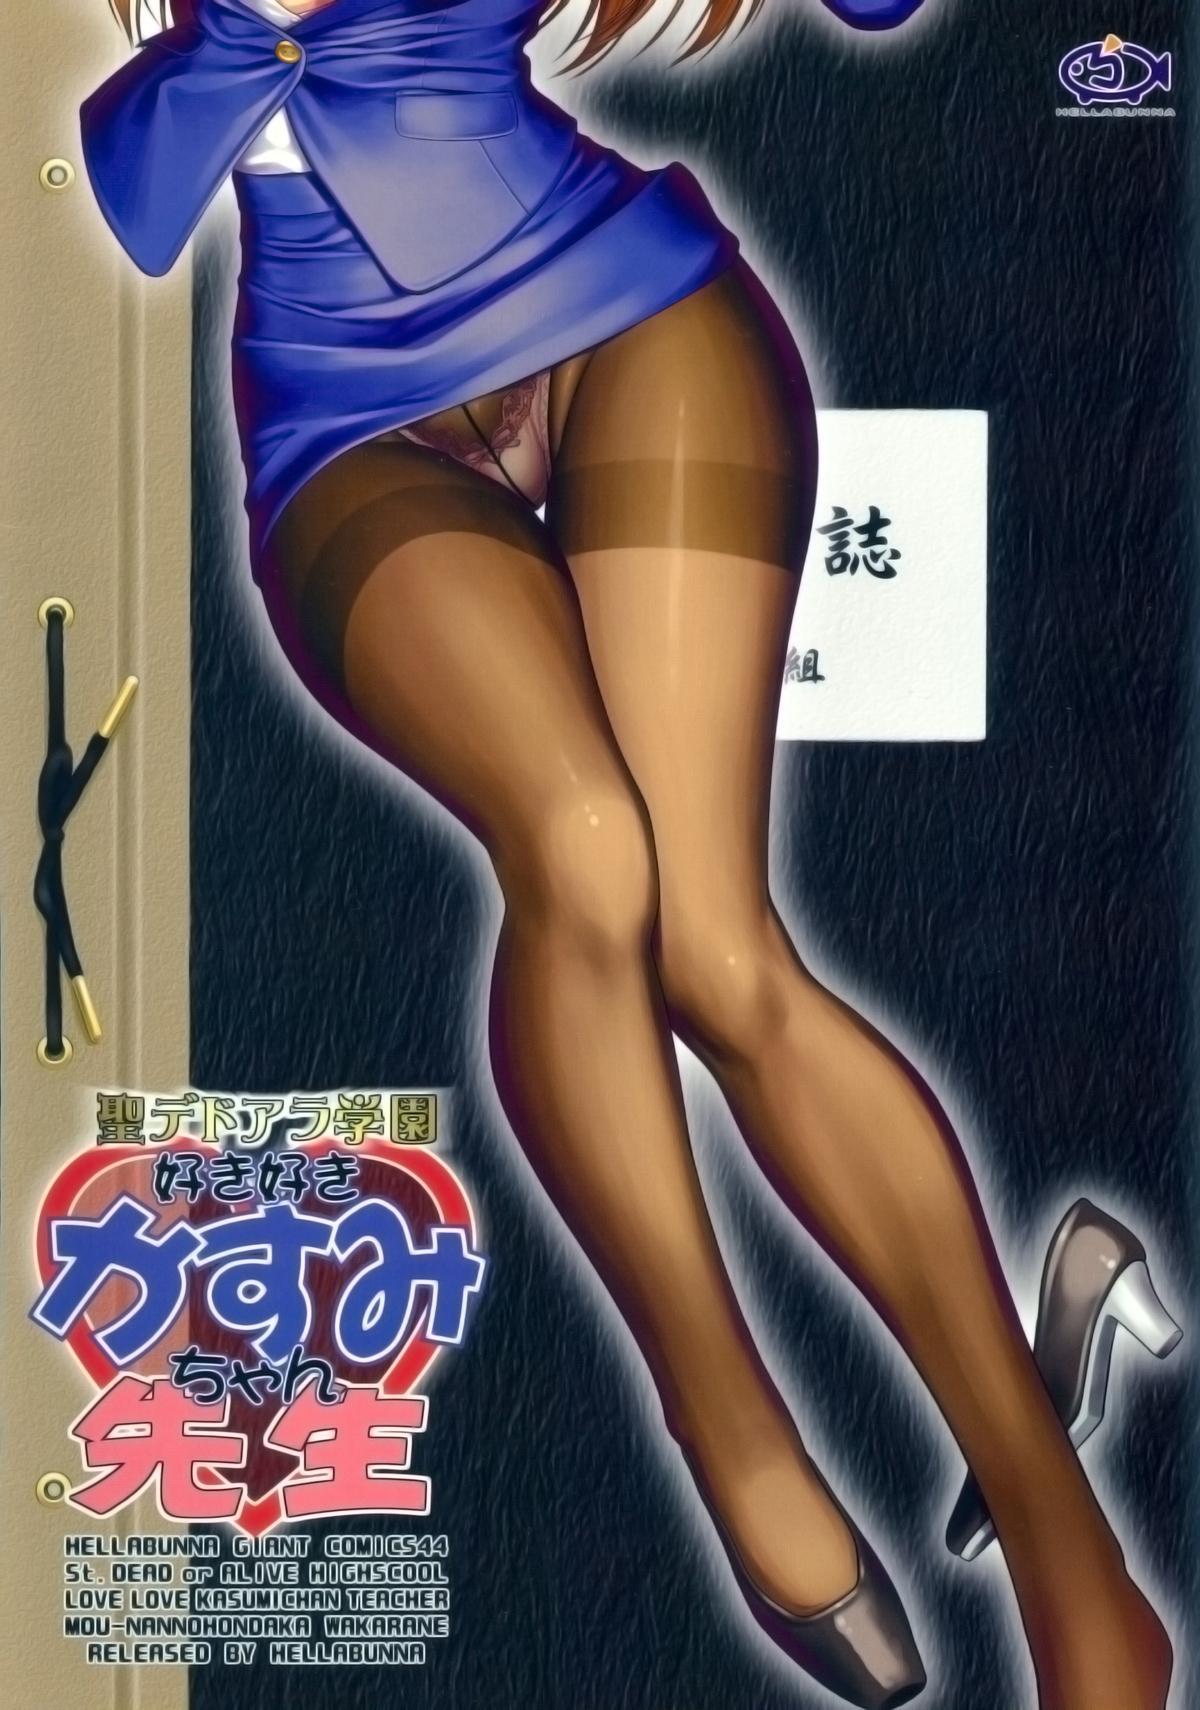 St. Dead or Alive Highschool - Love Love Kasumi Chan Teacher 25